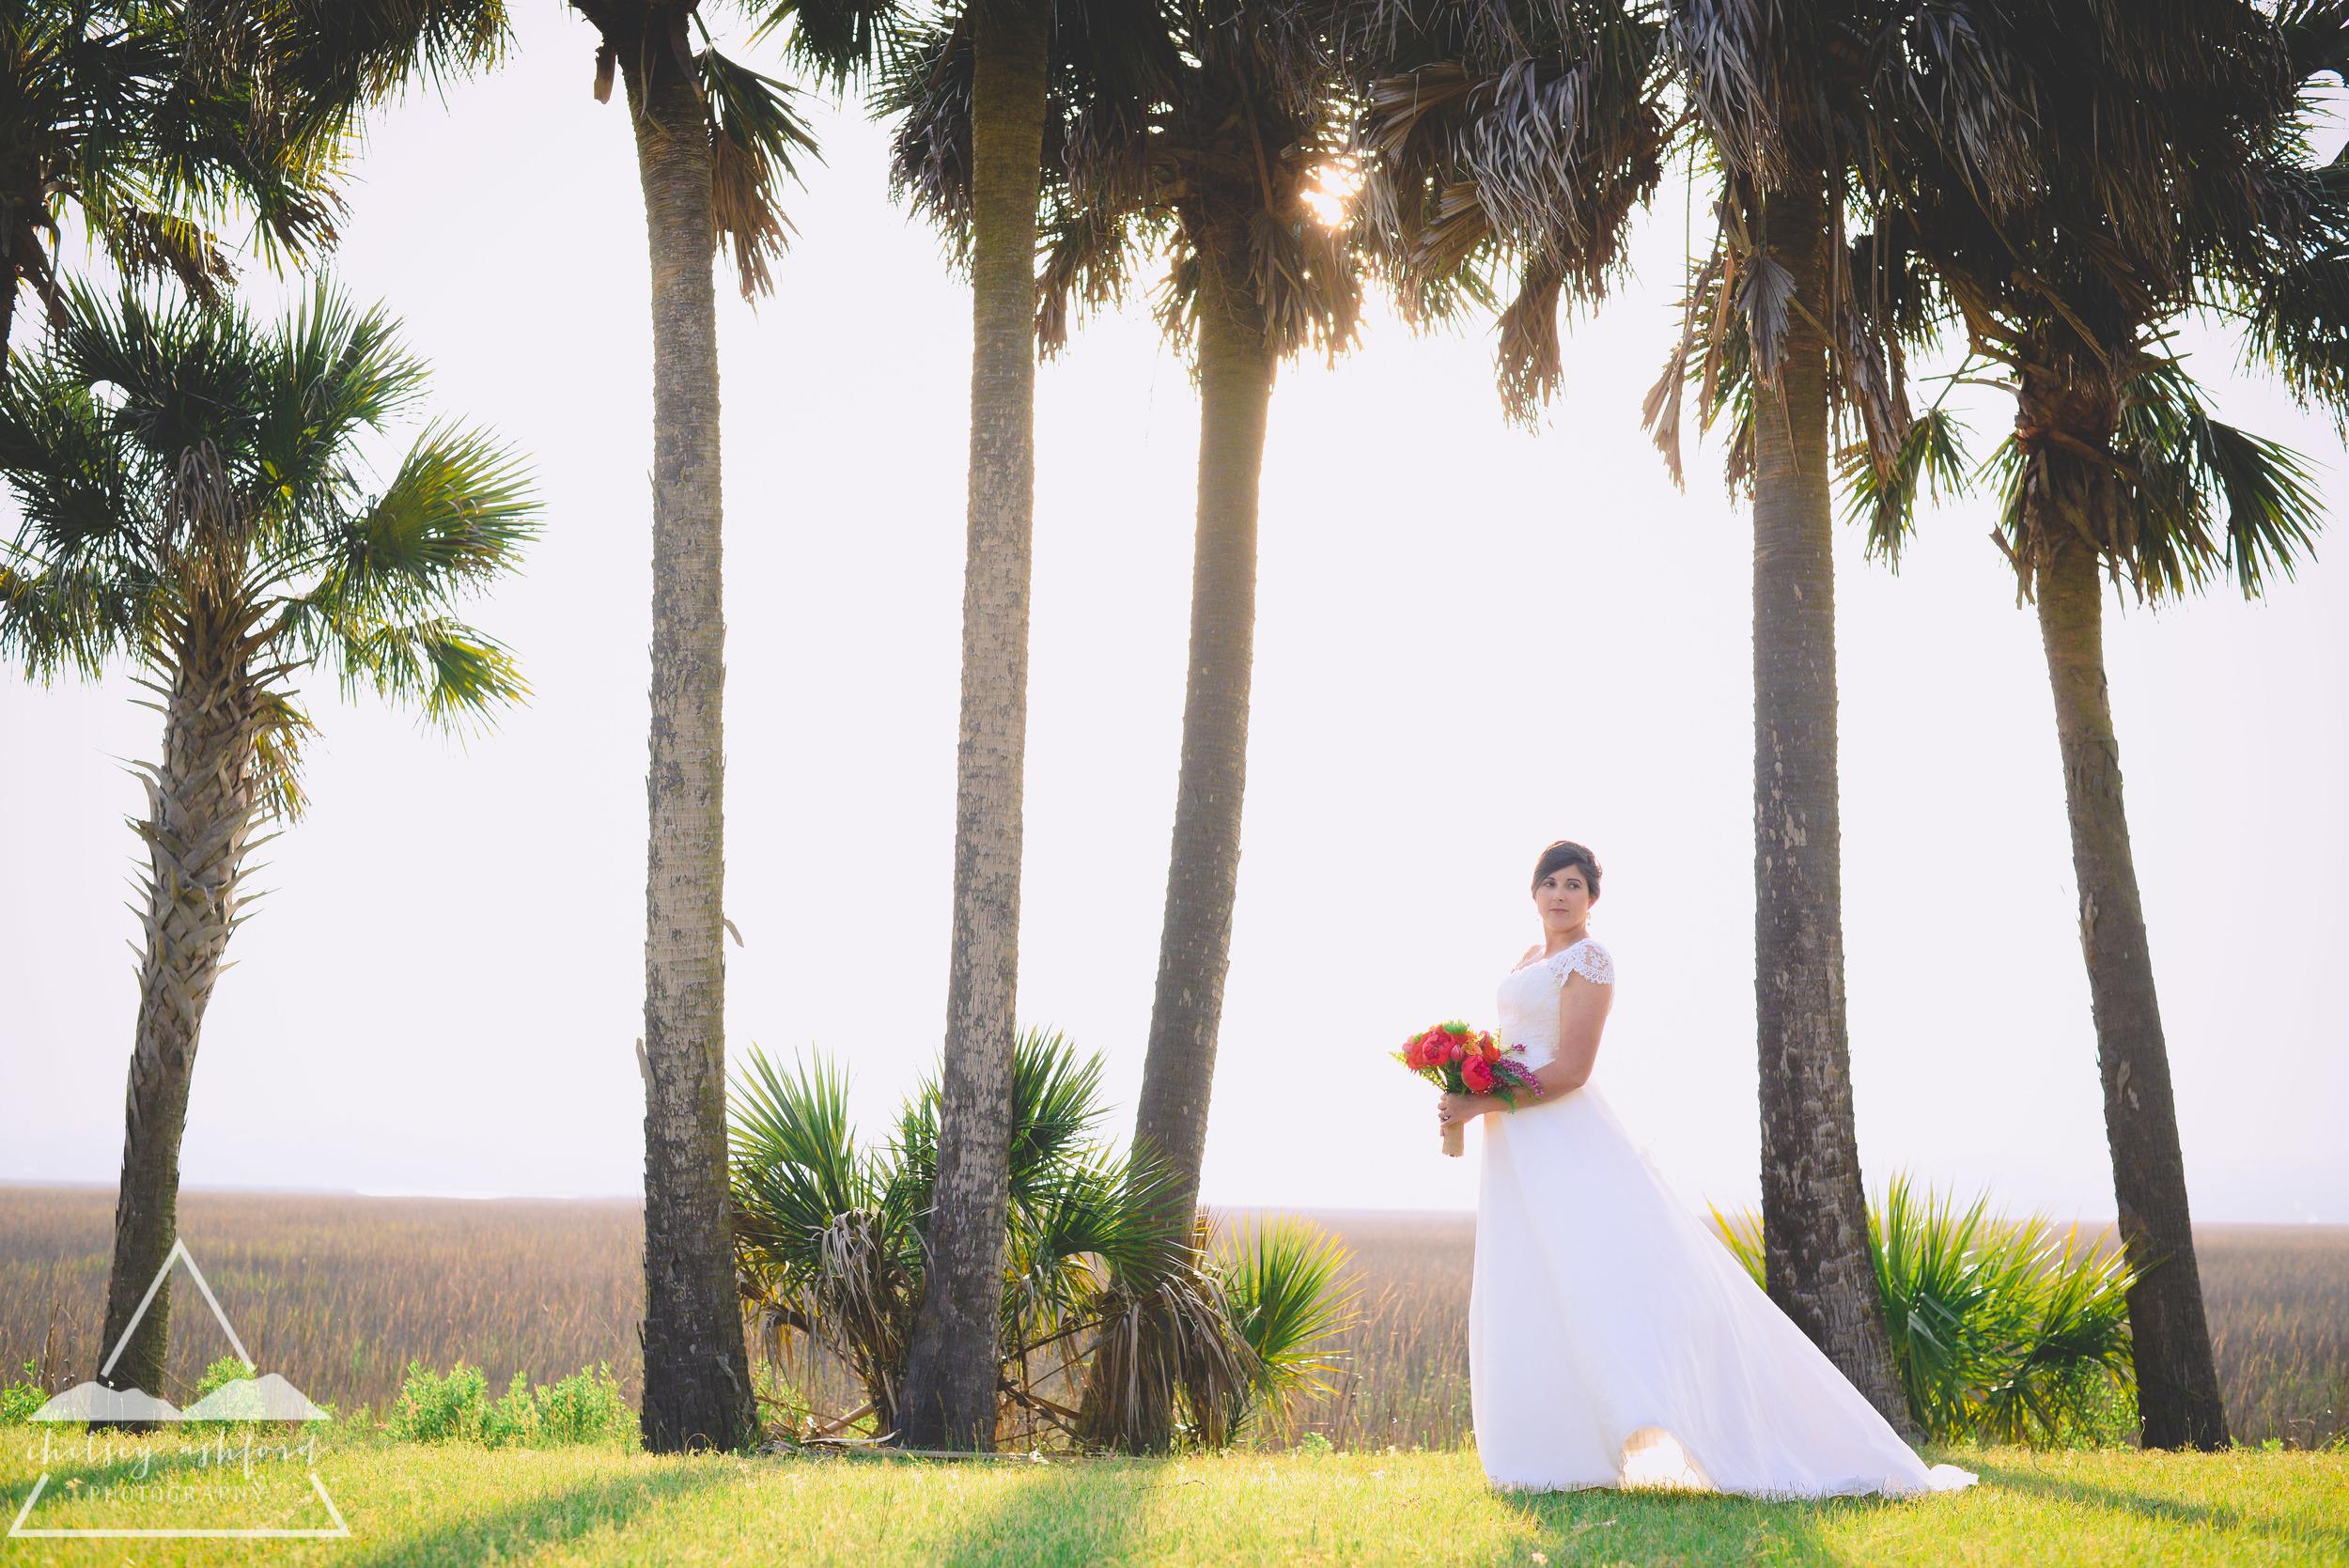 Sylvia_bridals_web-23.jpg